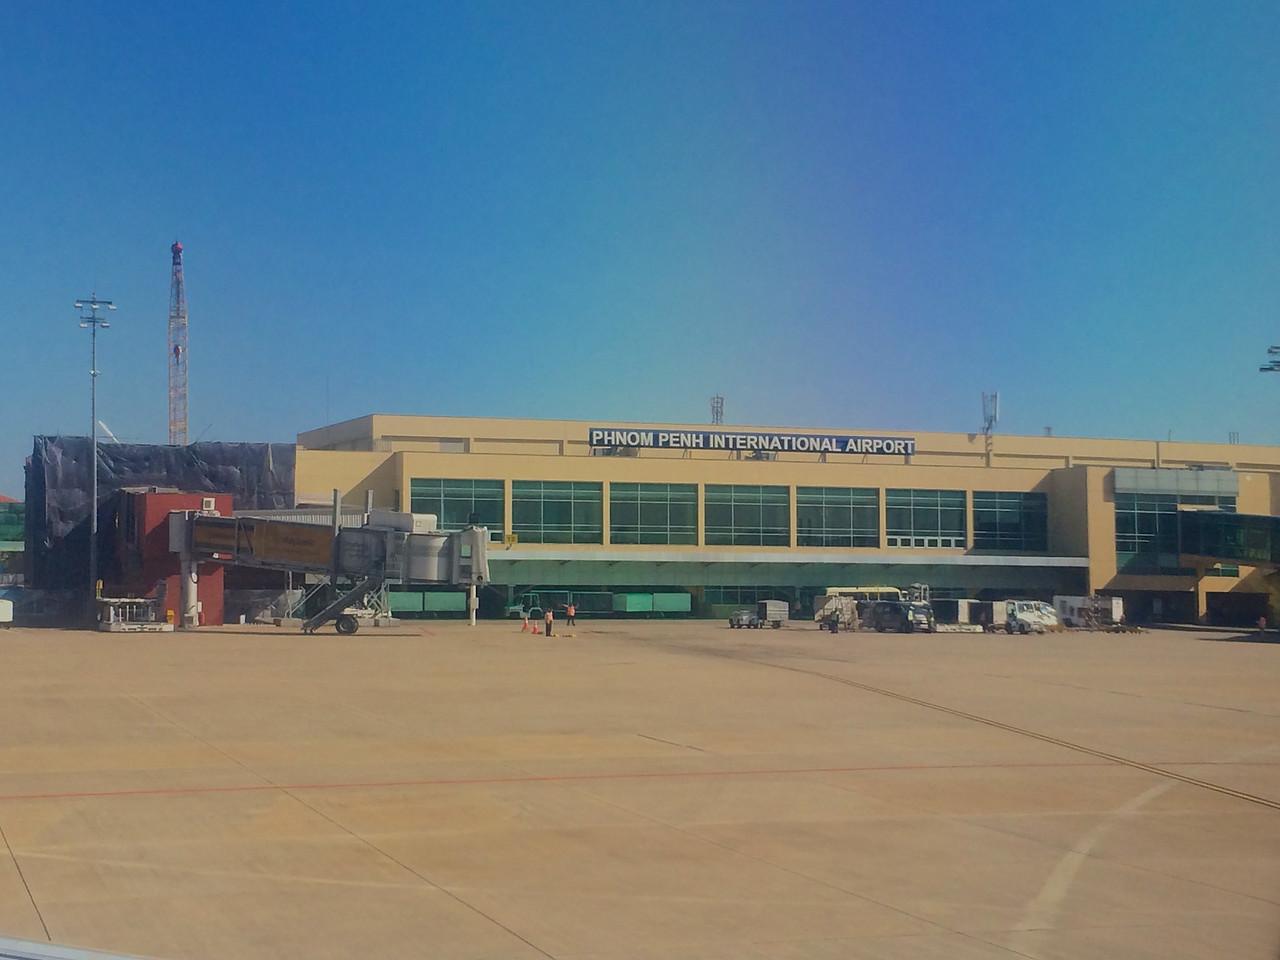 The Phnom Penh airport handles over 2 million passengers per year.